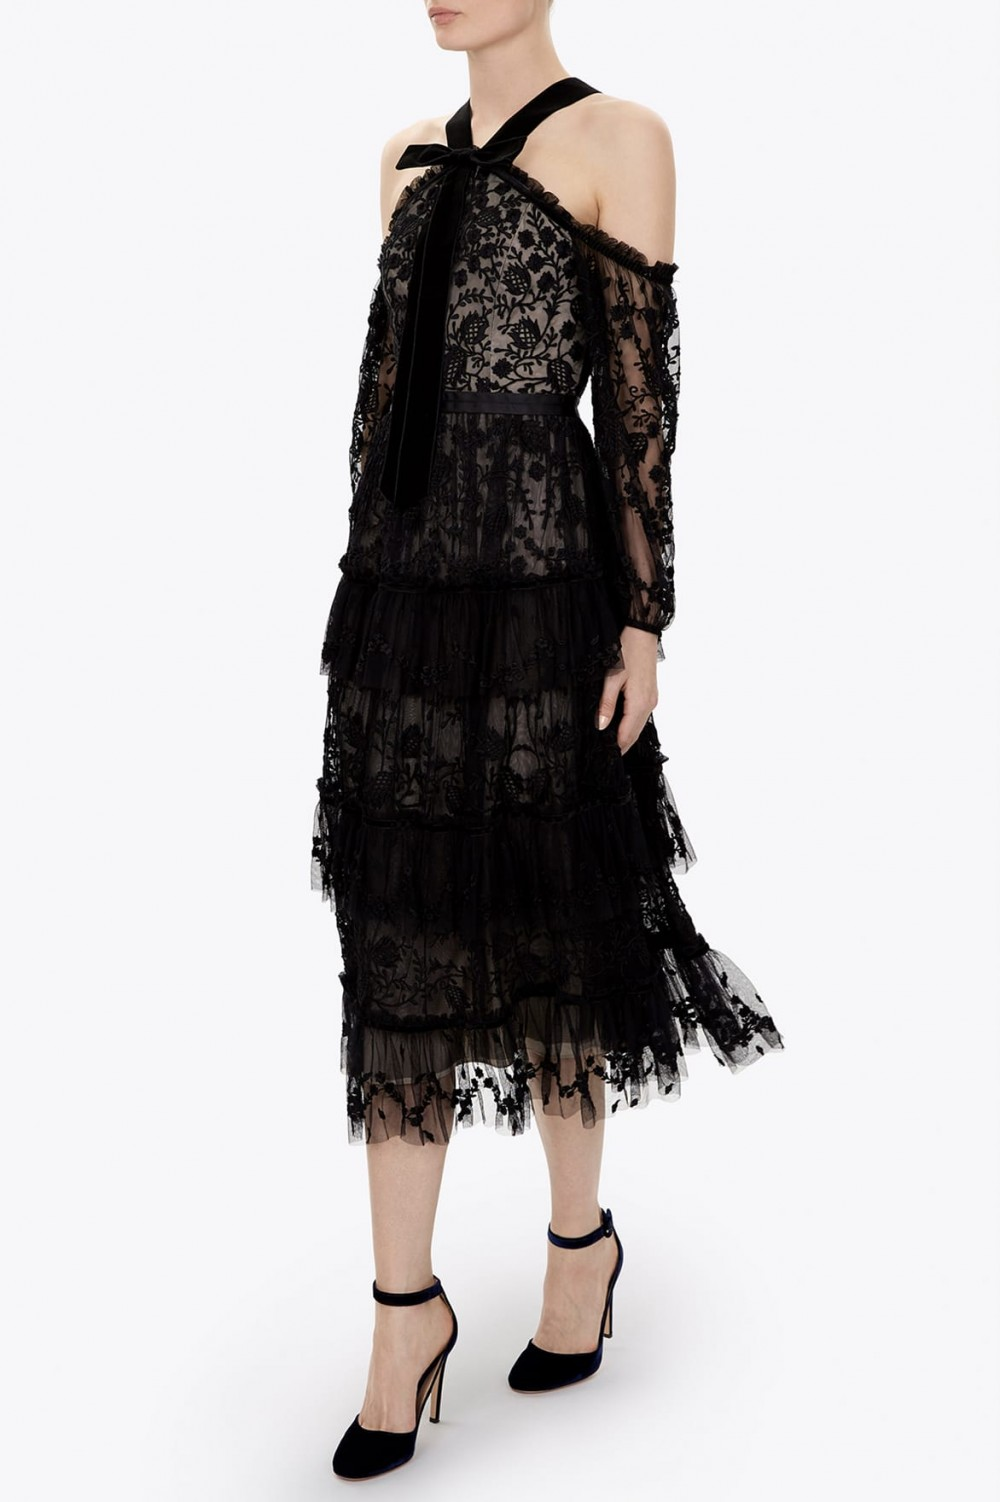 primrose_dress_black_1.jpg